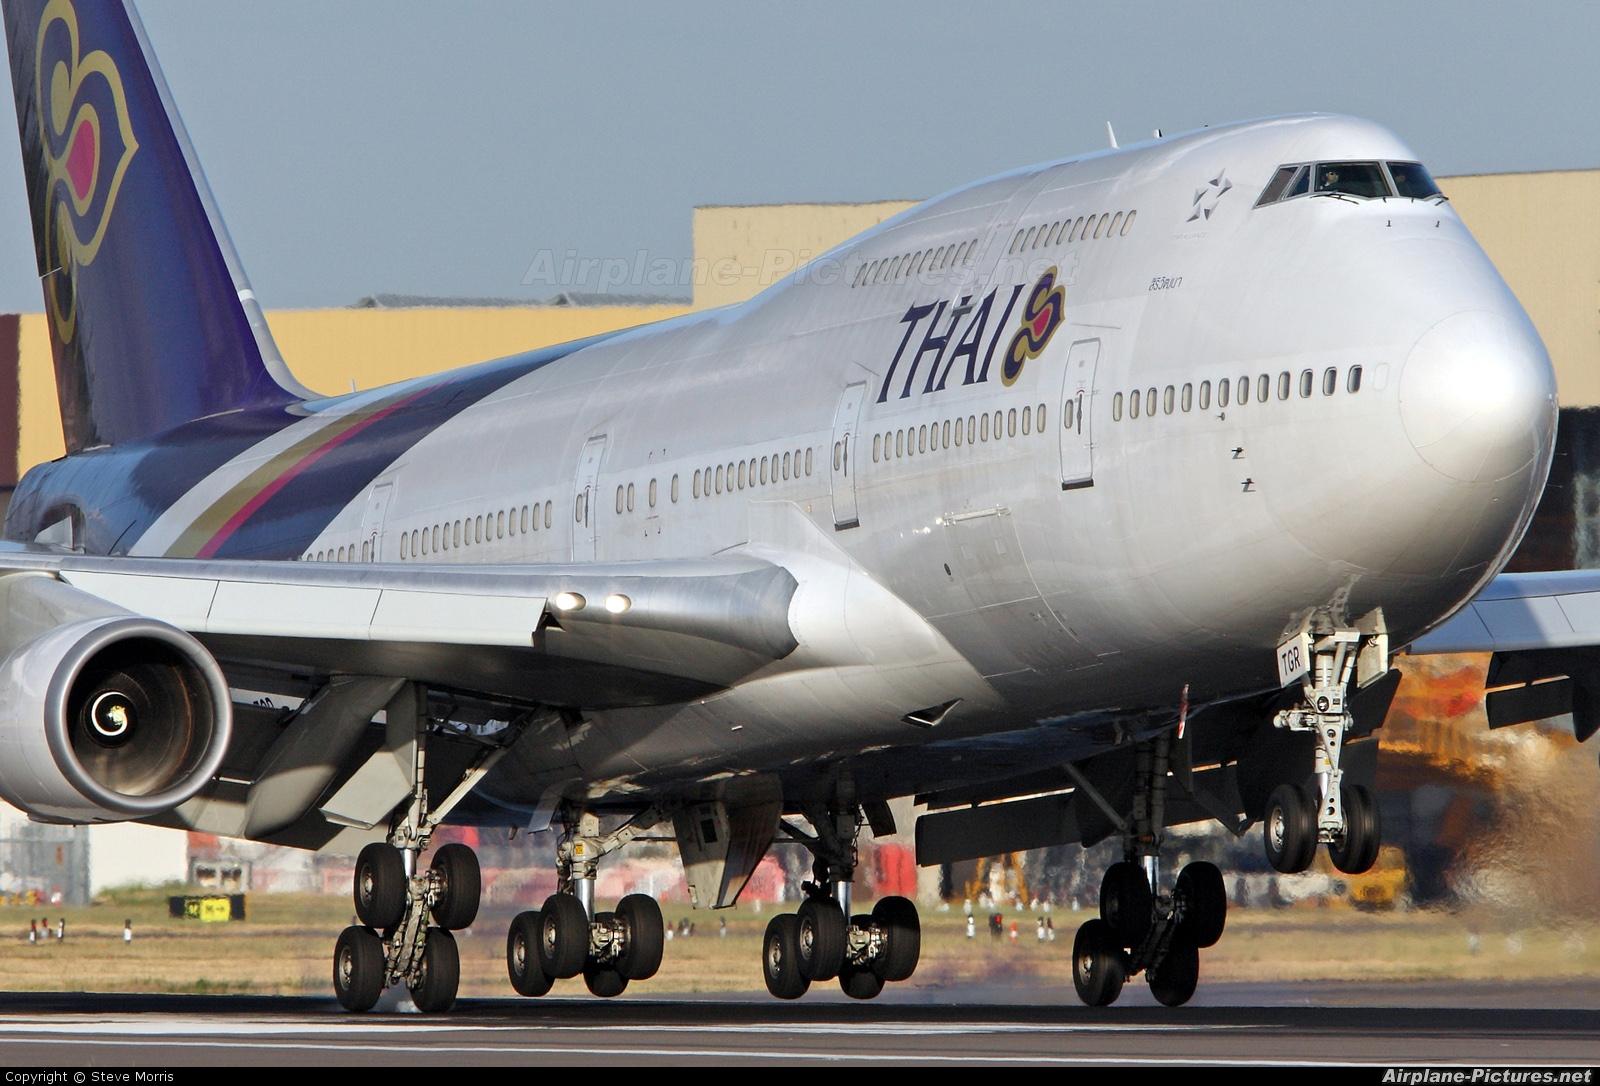 Thai Airways HS-TGR aircraft at London - Heathrow